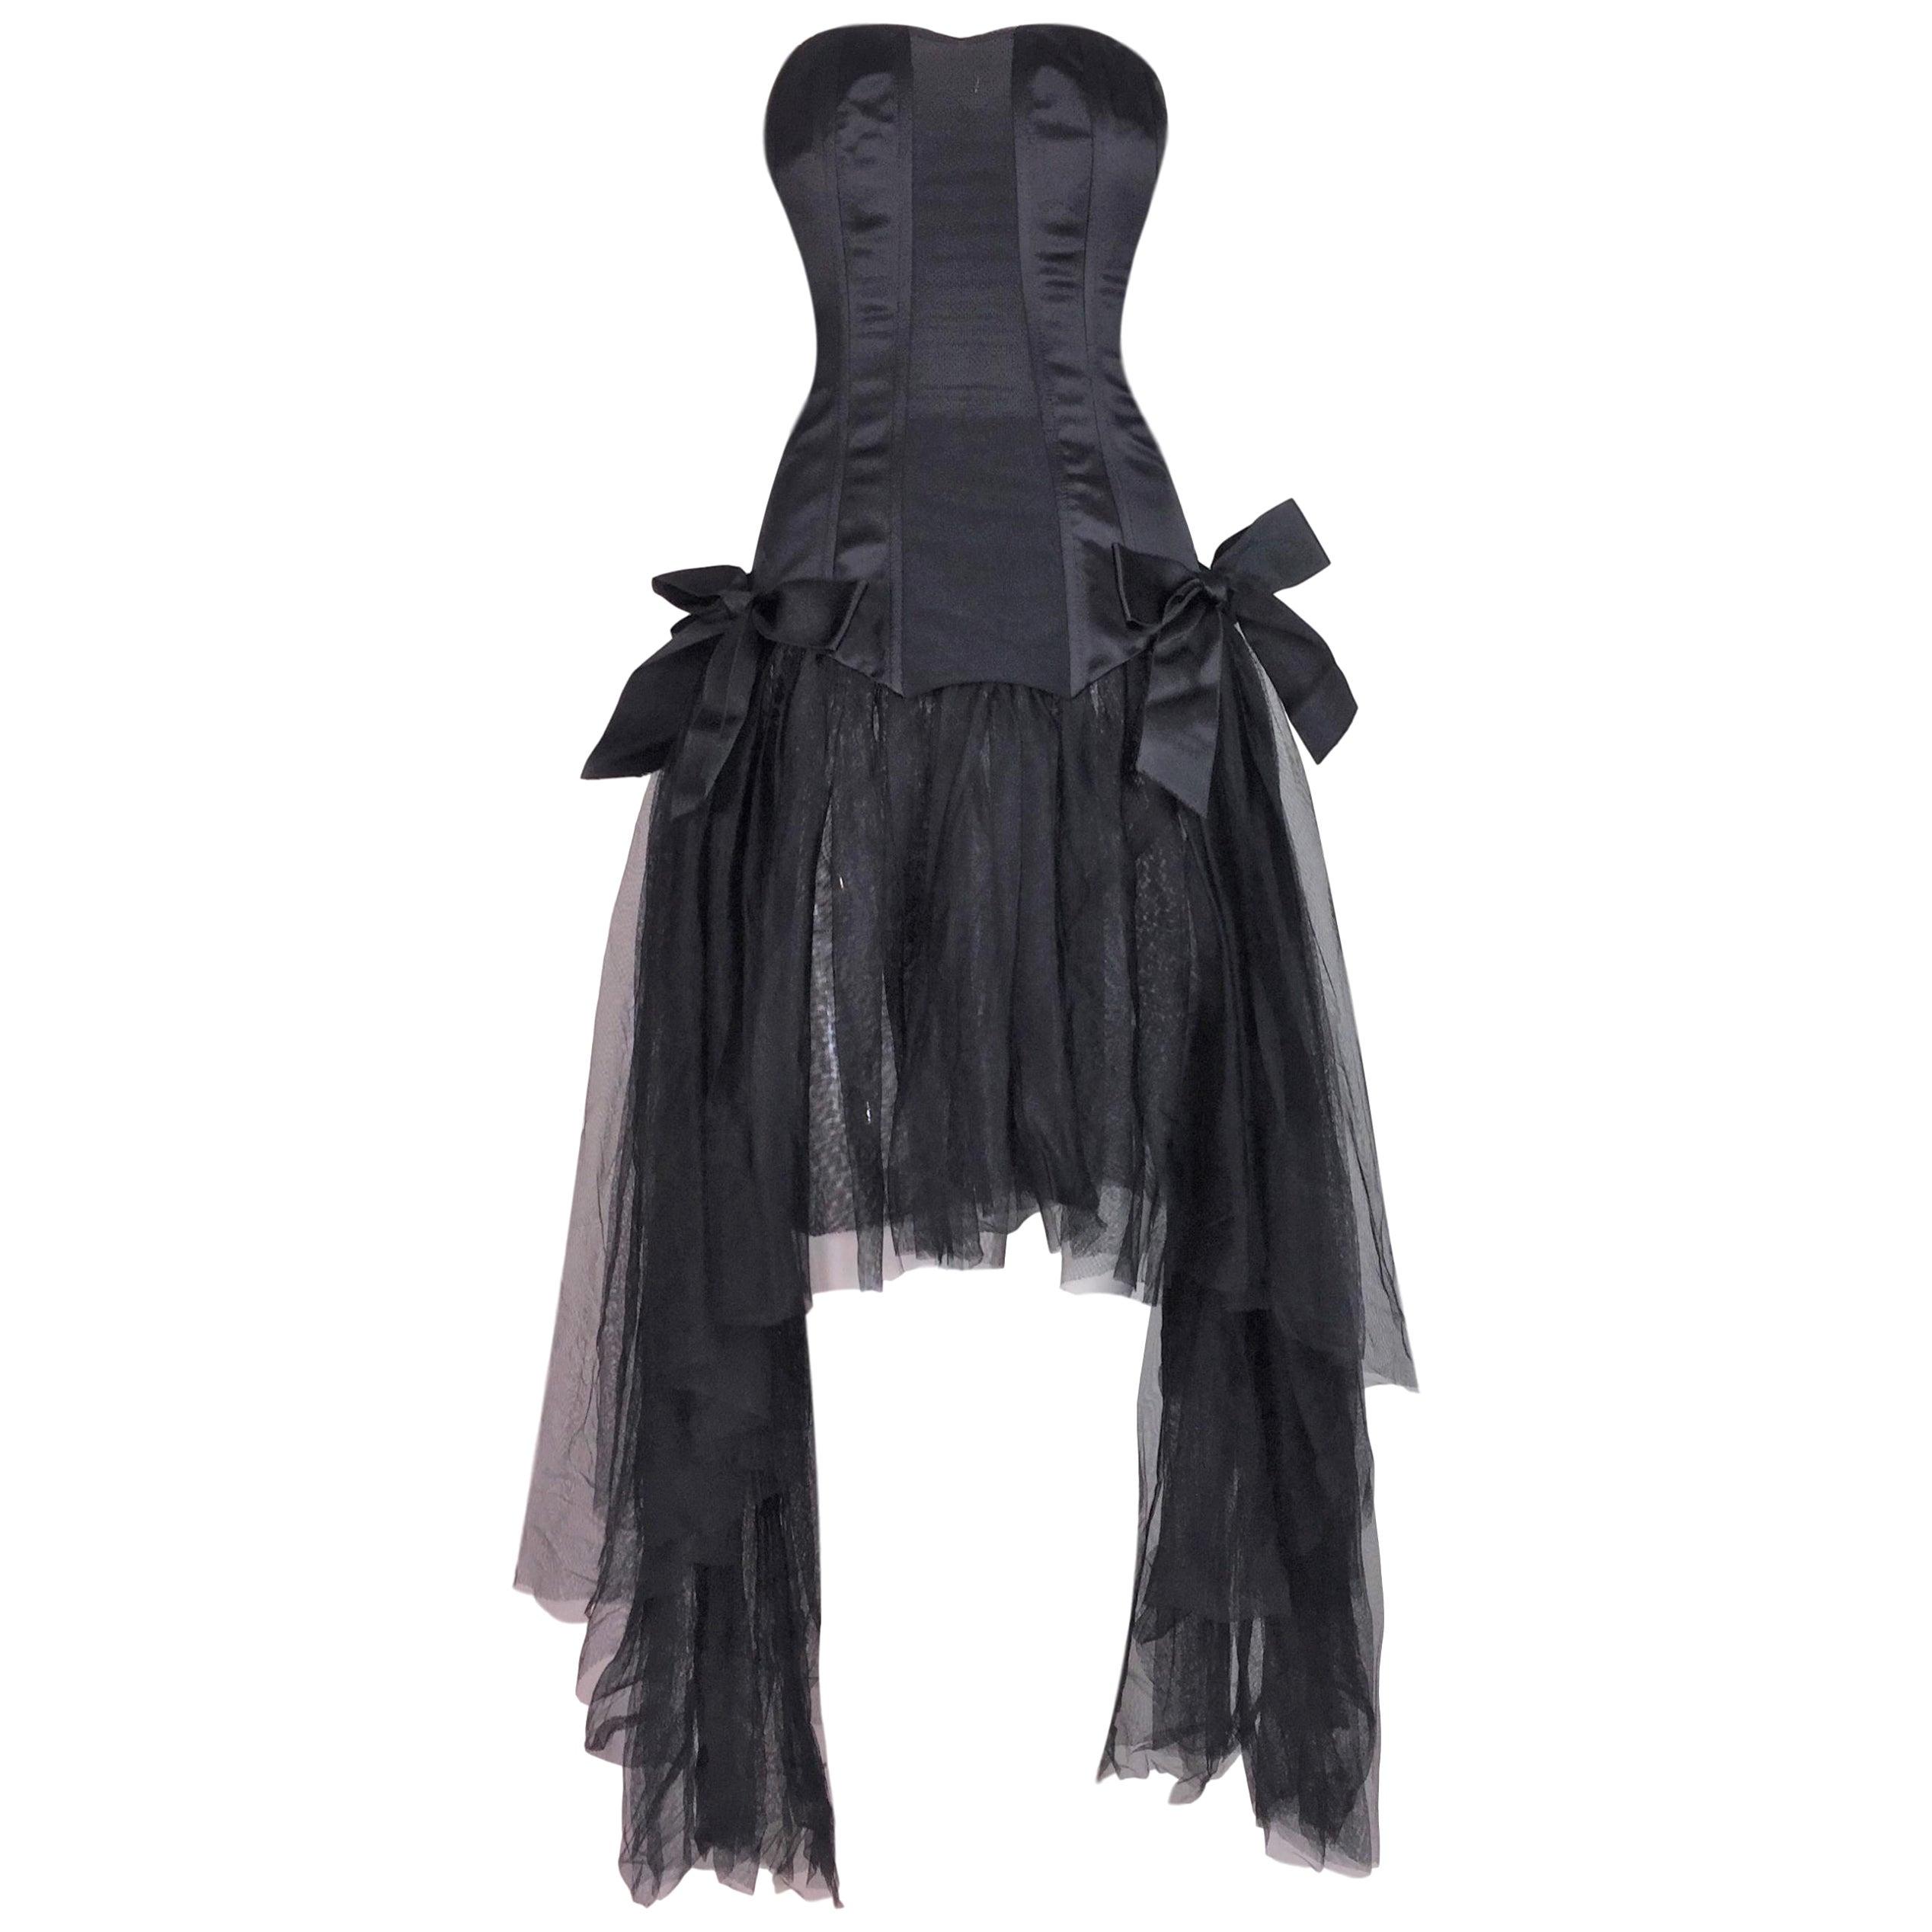 C. 1995 Chanel Ballerina Sheer Black Mesh Bustier Dress w/ Tulle & Bows